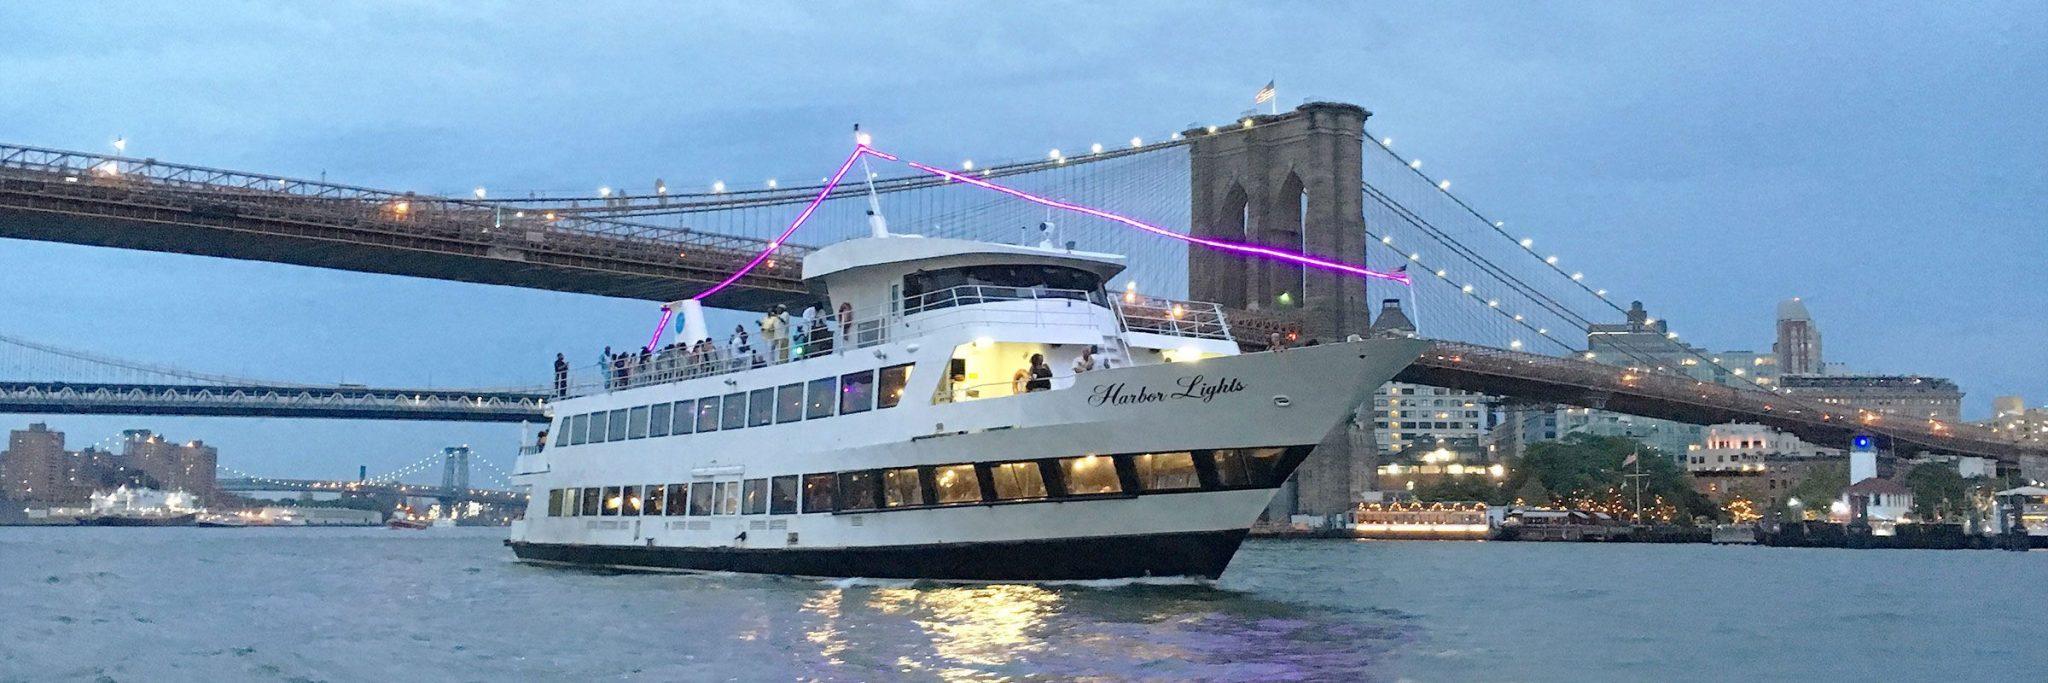 Harbor Lights Yacht Events